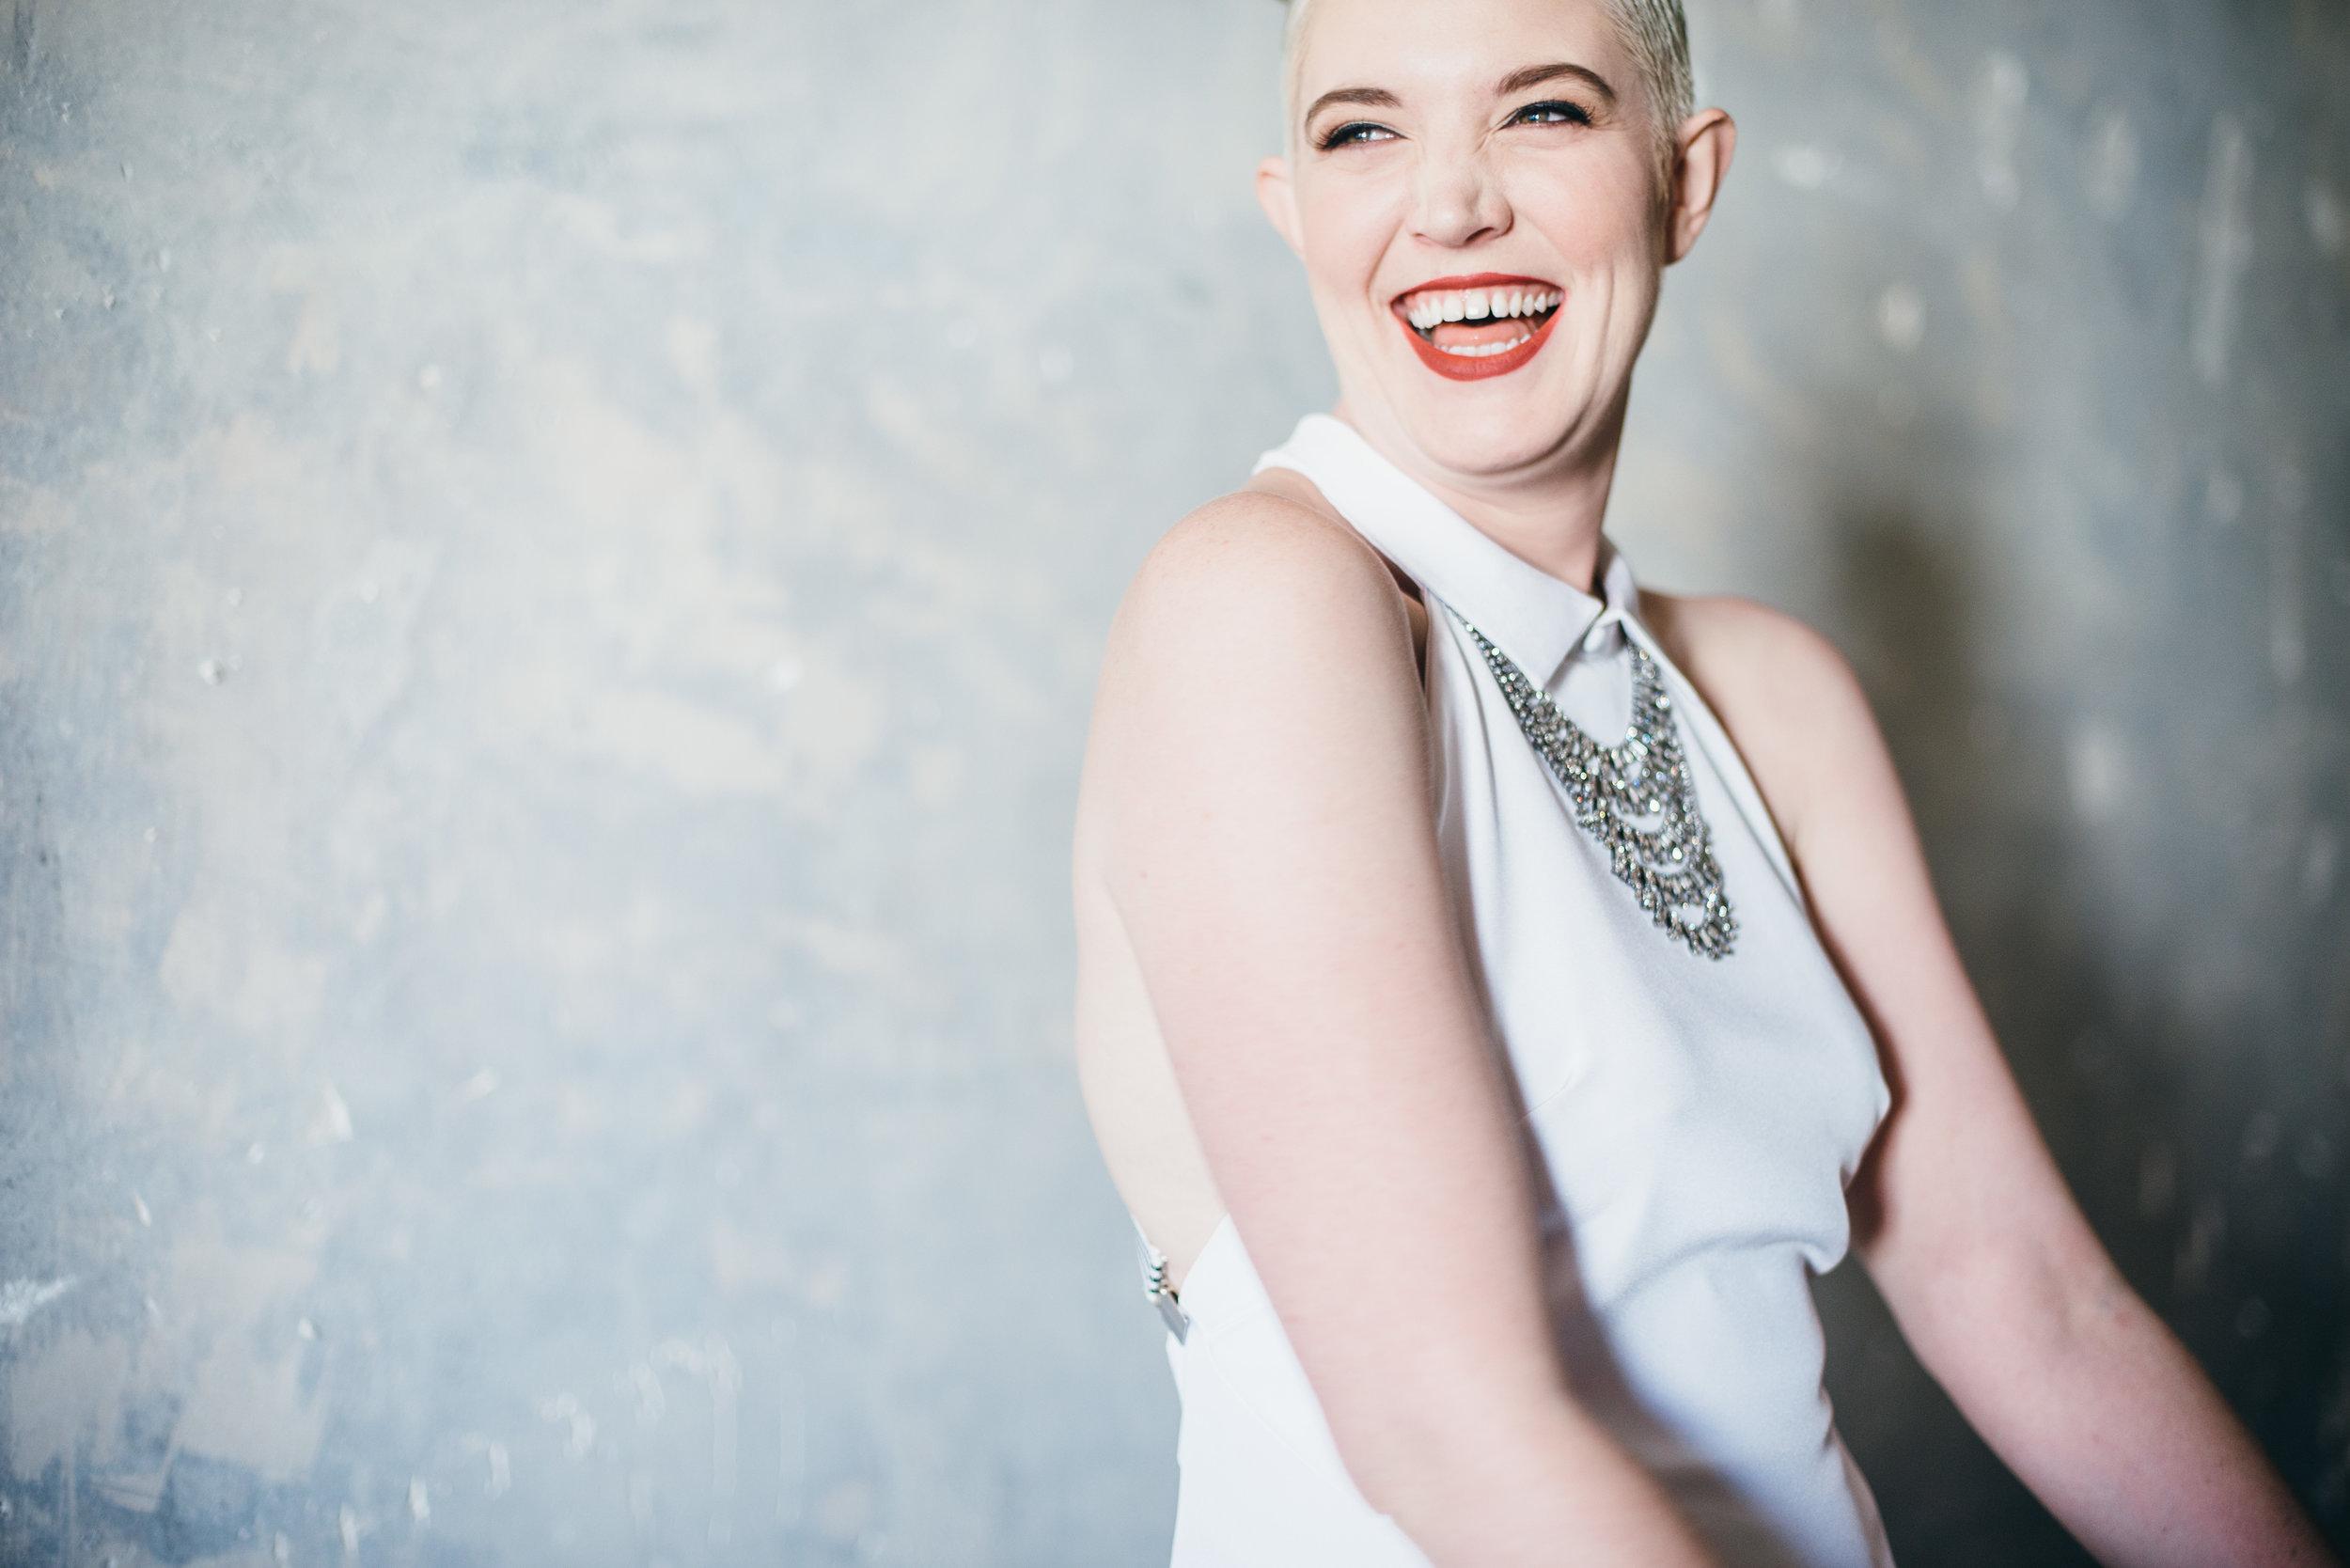 julia-hembree-photography-eden-village-church-wedding-savannah-warehouse-wedding-ivory-and-beau-bridal-boutique-savannah-florist-savannah-wedding-planner-savannah-event-design-scad-wedding-artist-wedding-savannah-funky-wedding-handmade-wedding-10.jpg